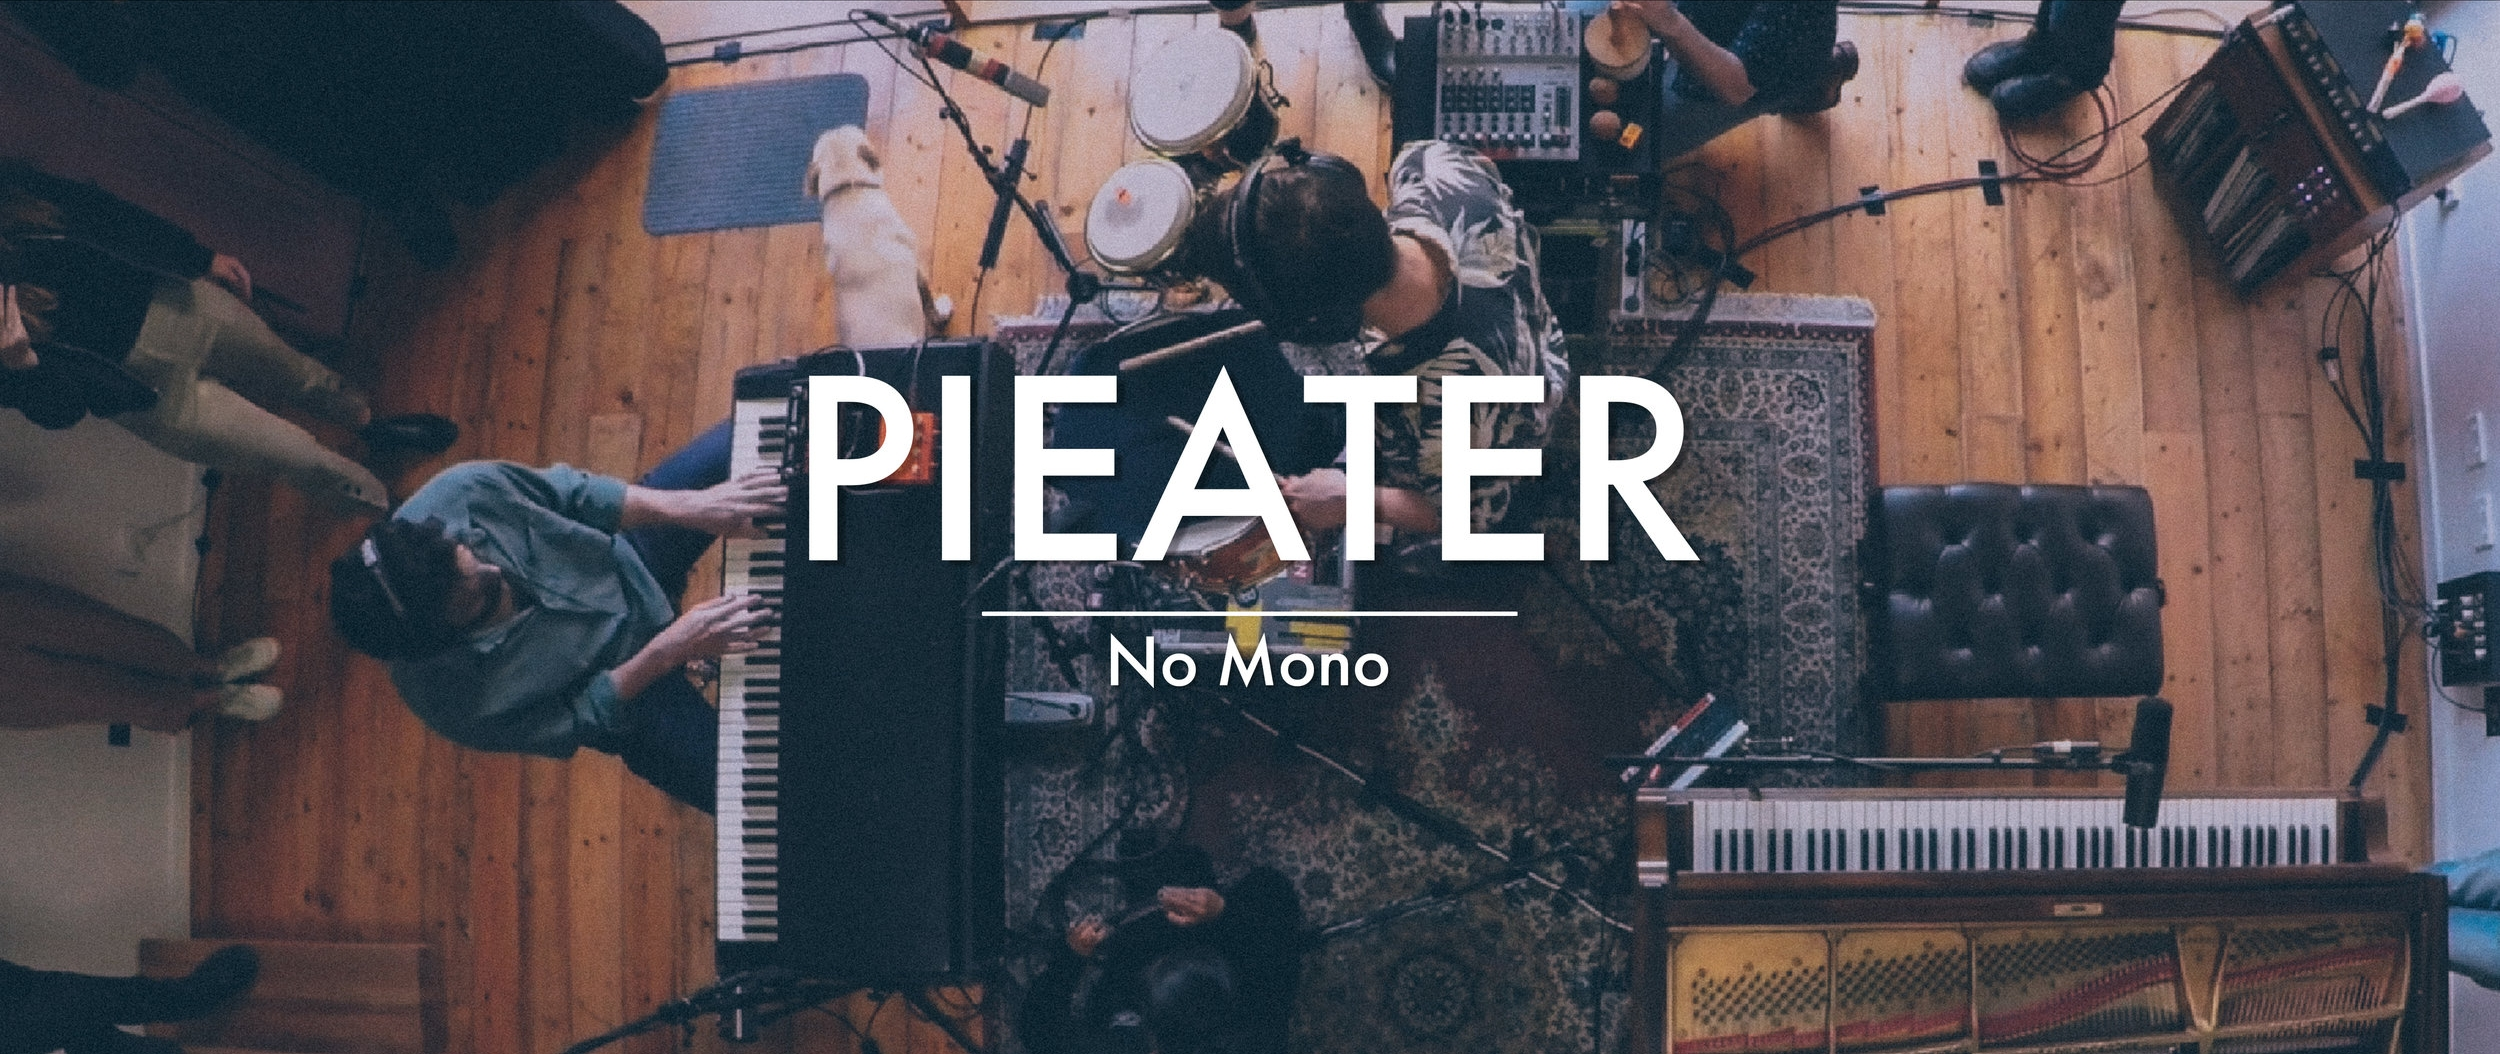 pie-eater-no-mono.jpg